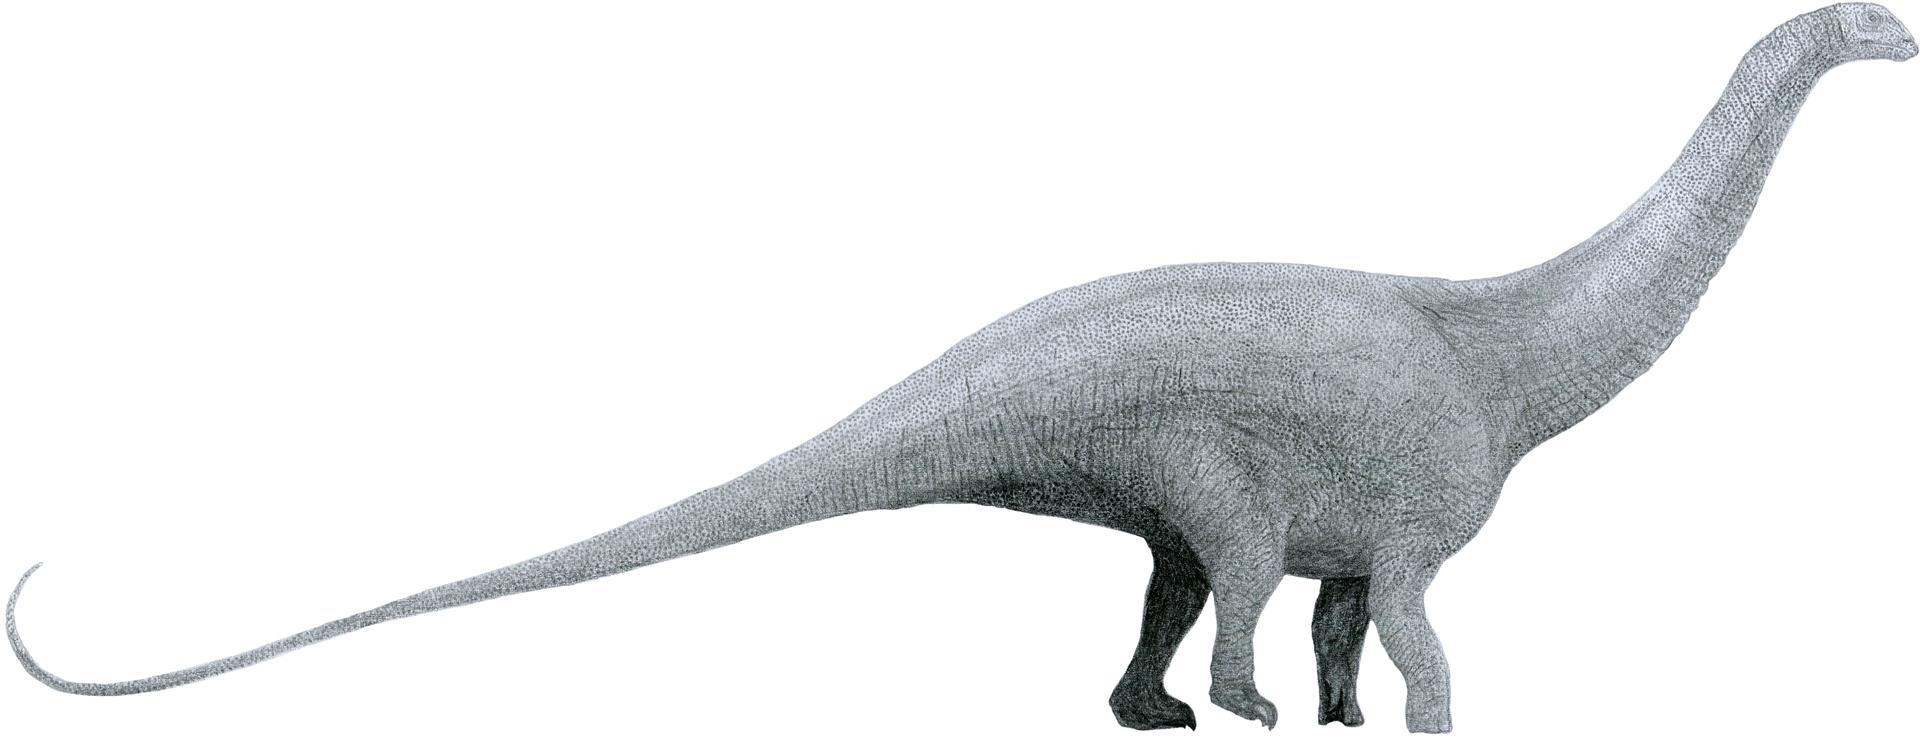 Key Difference - Brontosaurus vs Brachiosaurus